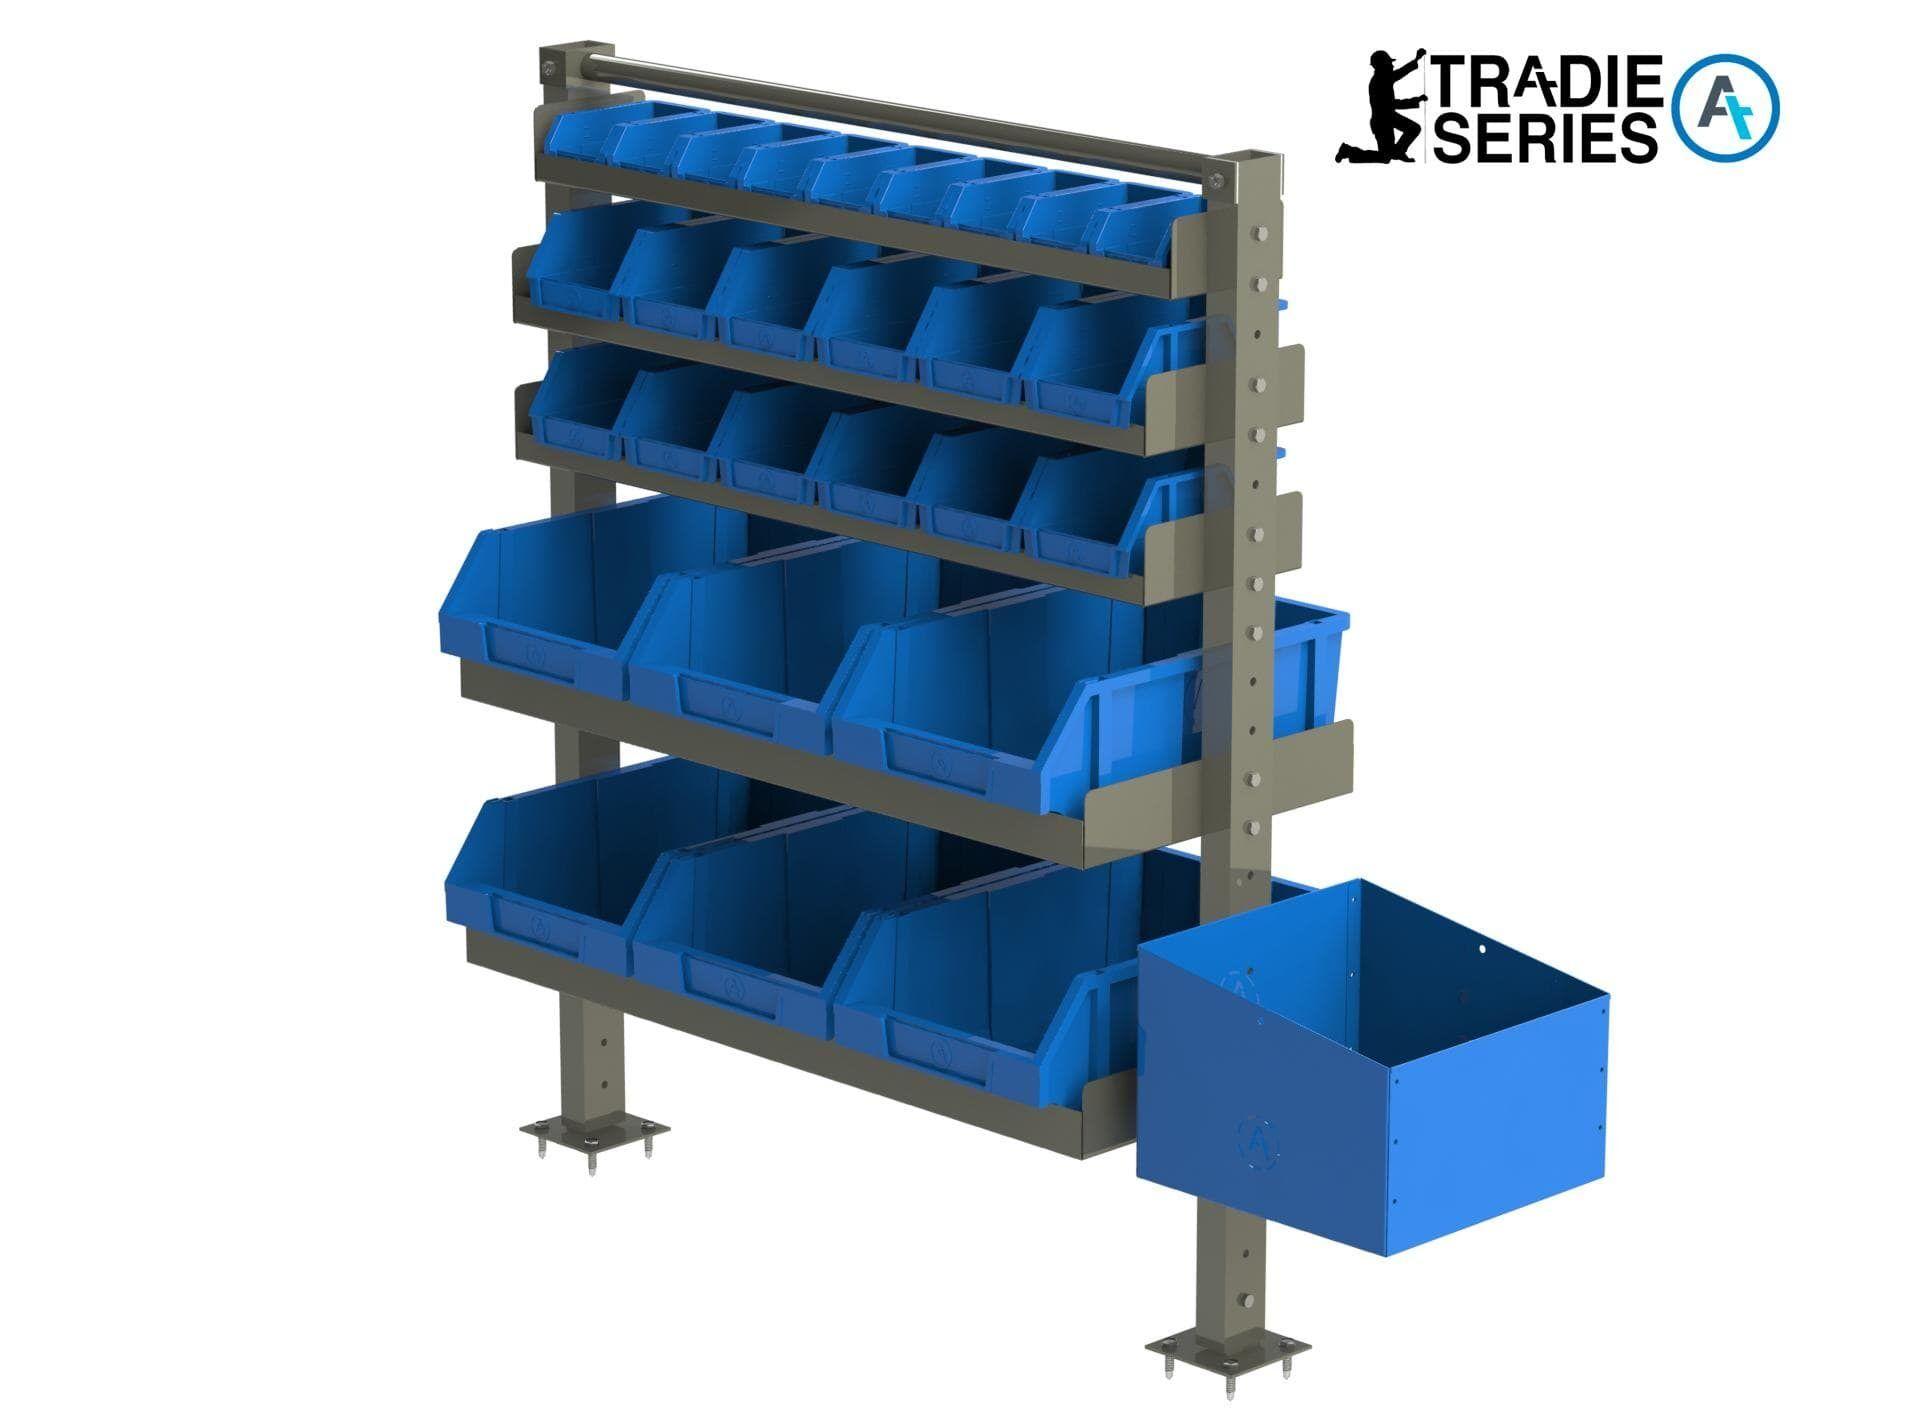 Trade Shelving kg Gas Bottle Holder